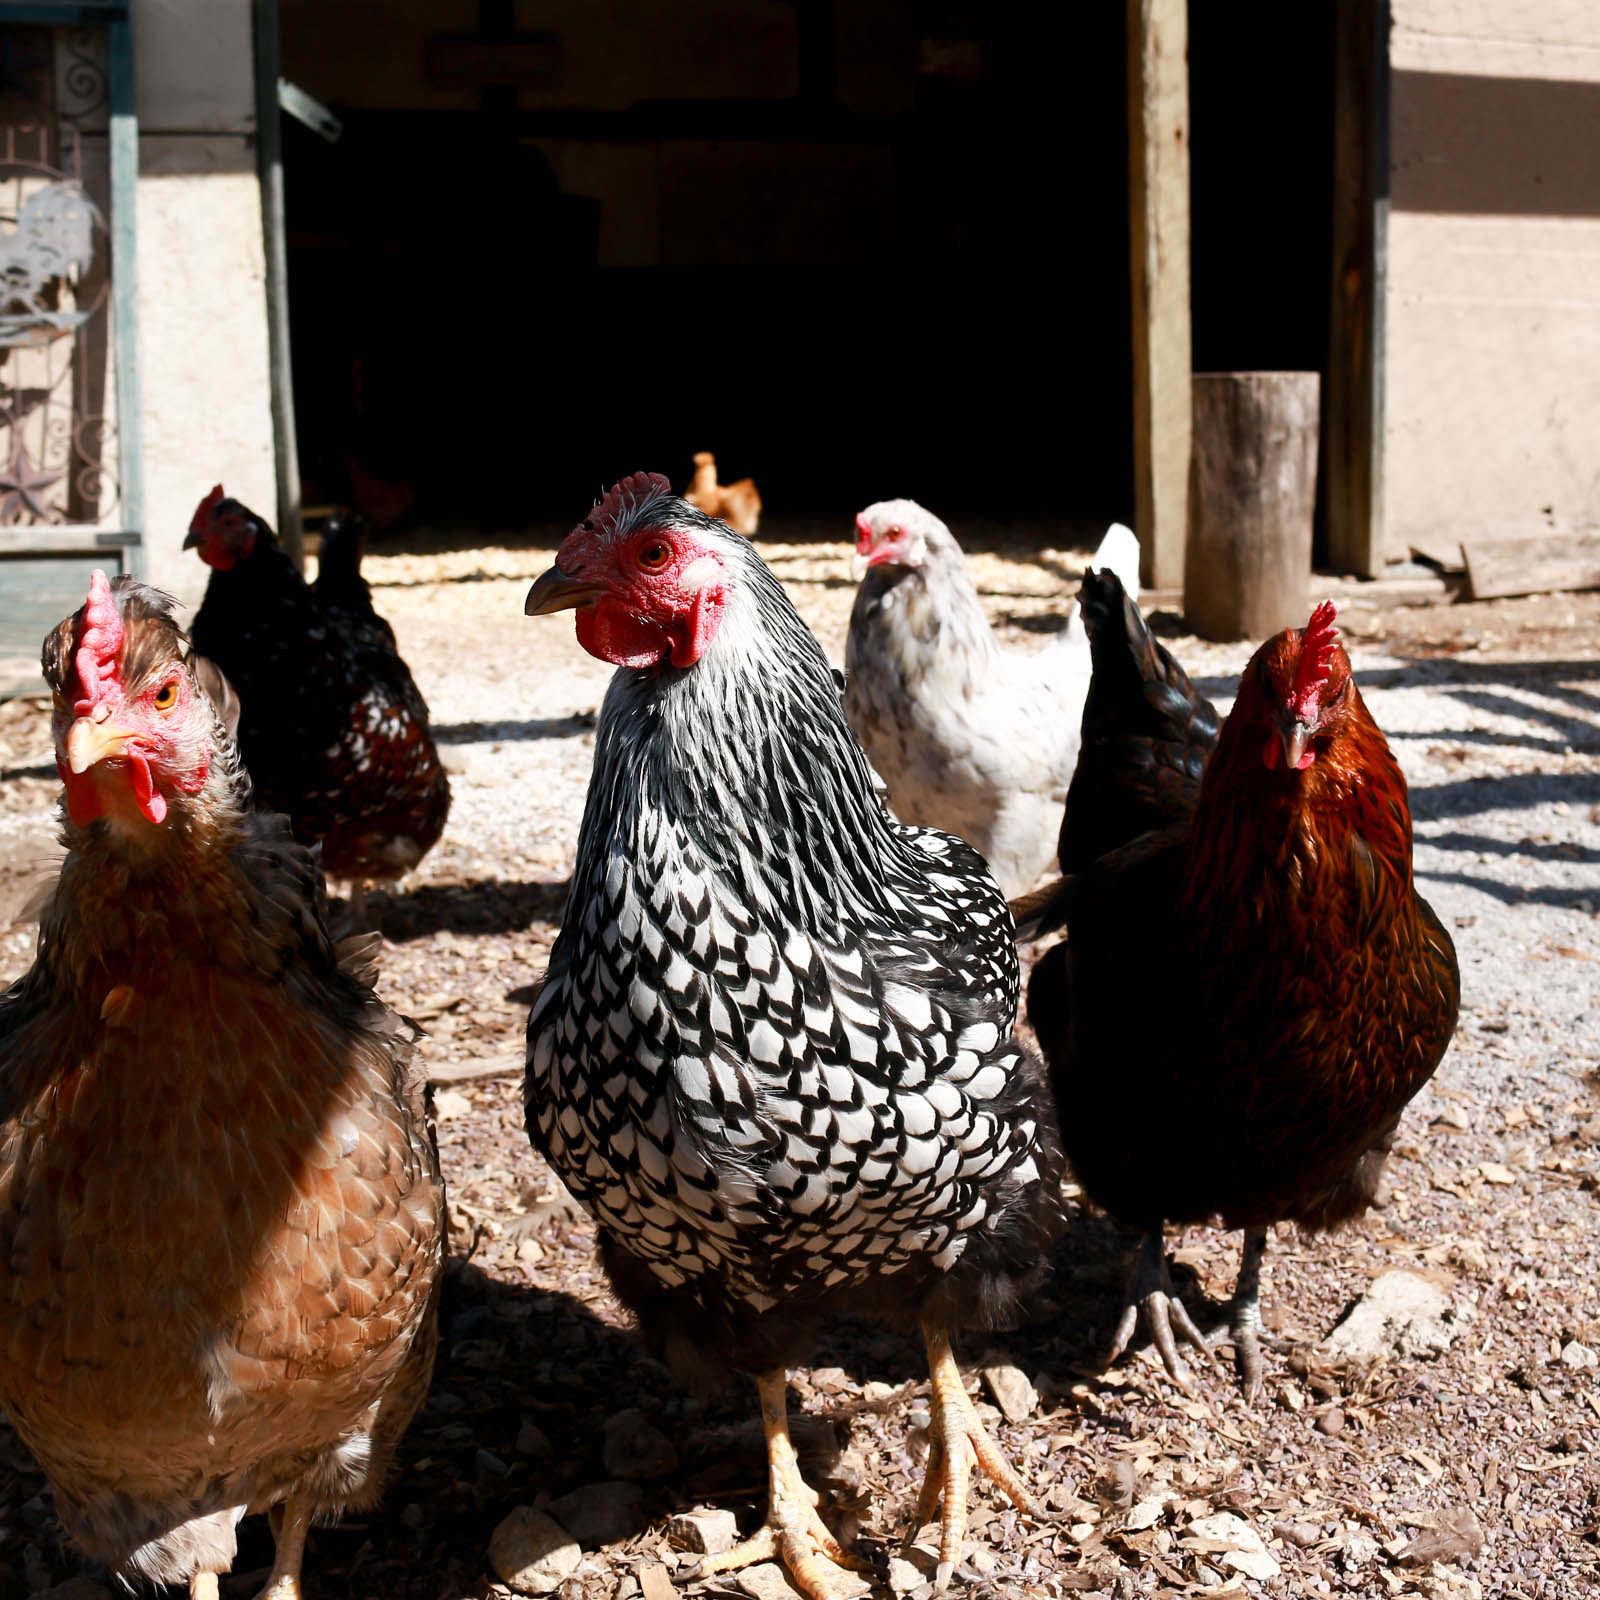 Waterloo chickens